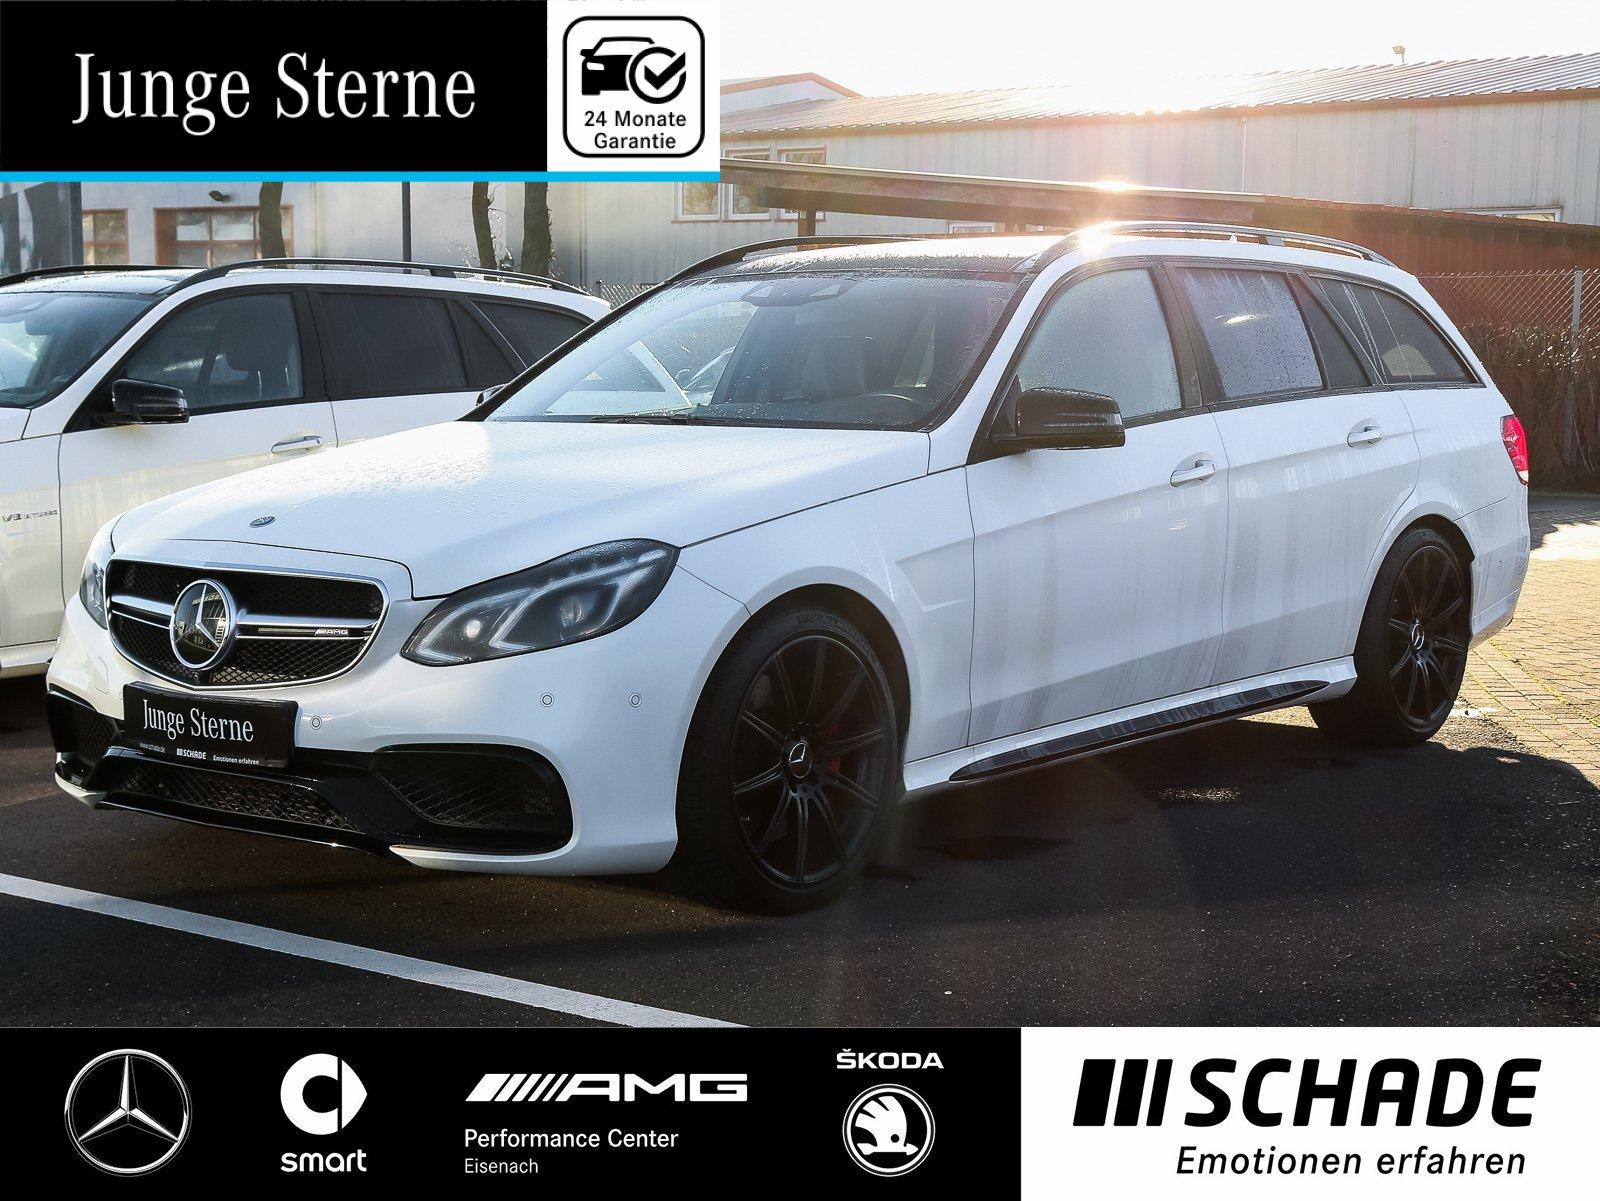 Mercedes-Benz E 63 S AMG T 4M NP:150.761*Panorama*Sitzklima*, Jahr 2016, Benzin